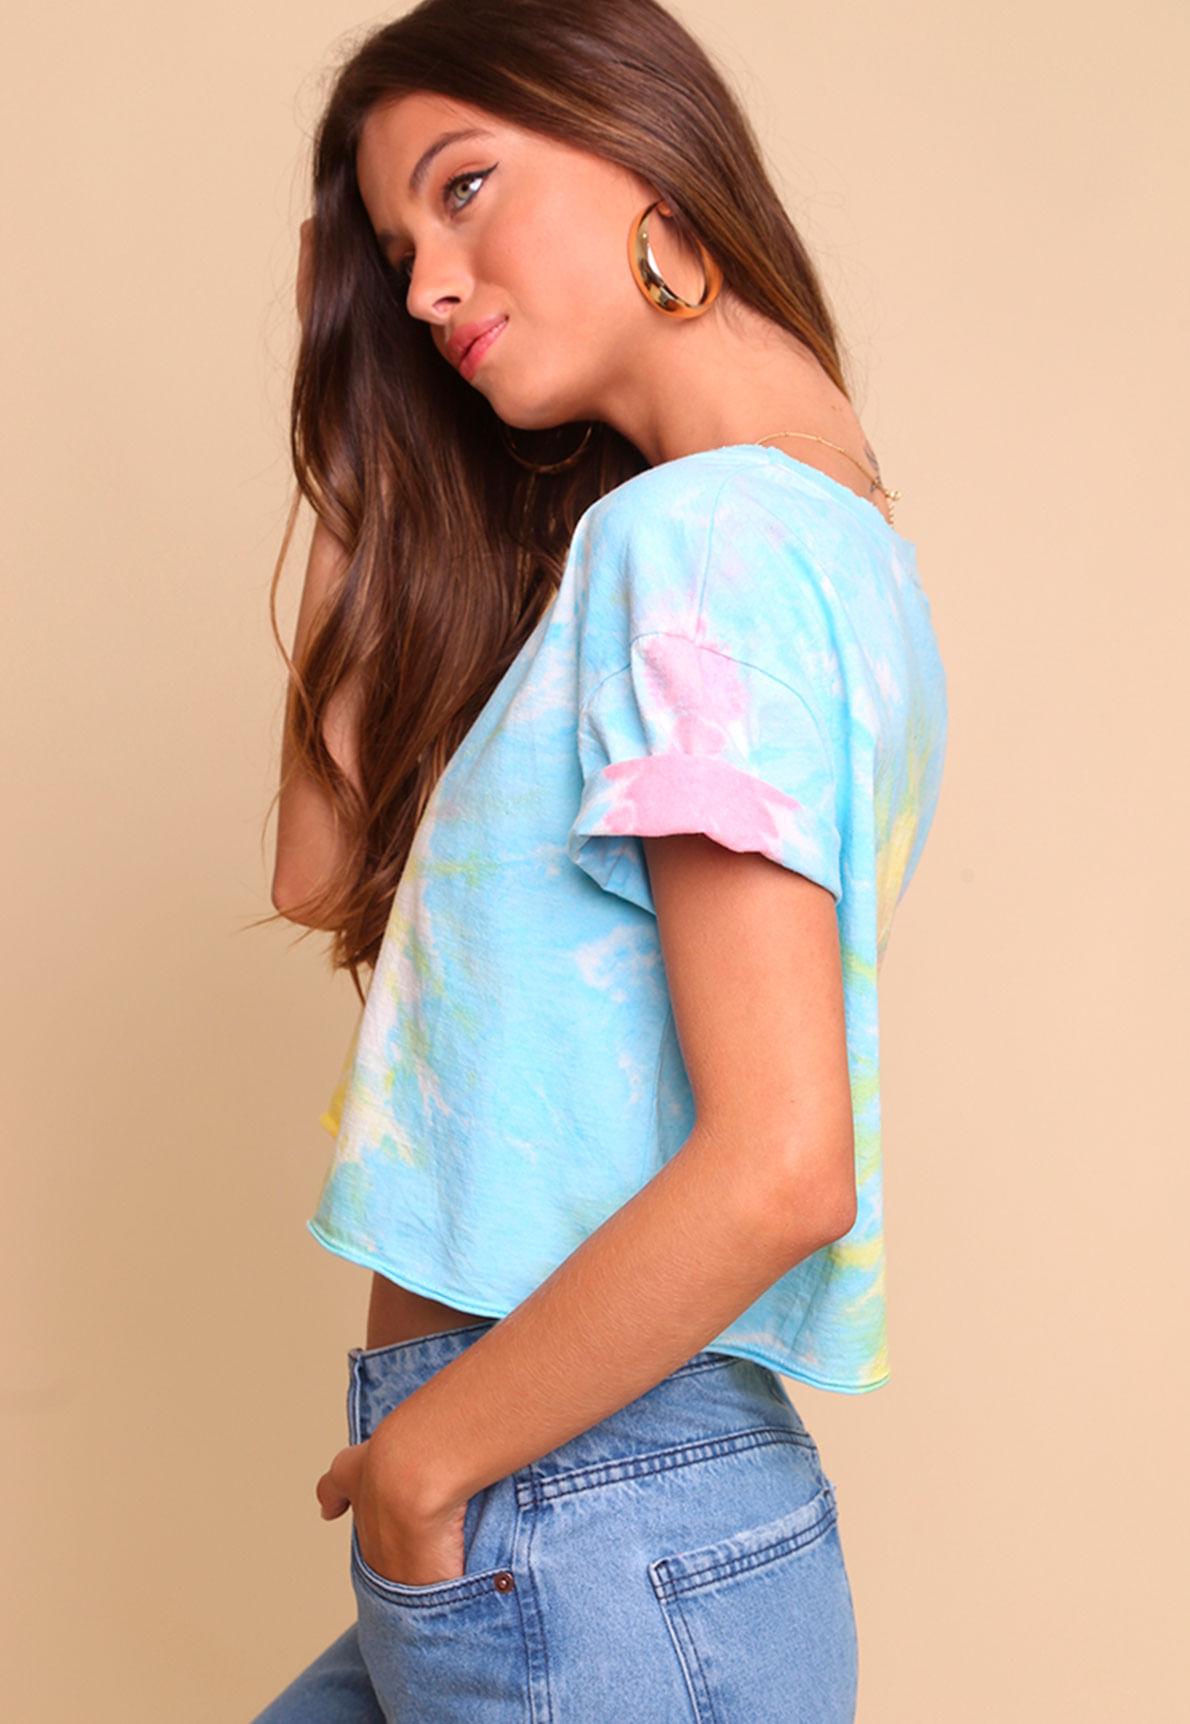 29763-T-Shirt-Mundo-Lolita-Feminina-Cropped-Tie-Dye-Lola-02